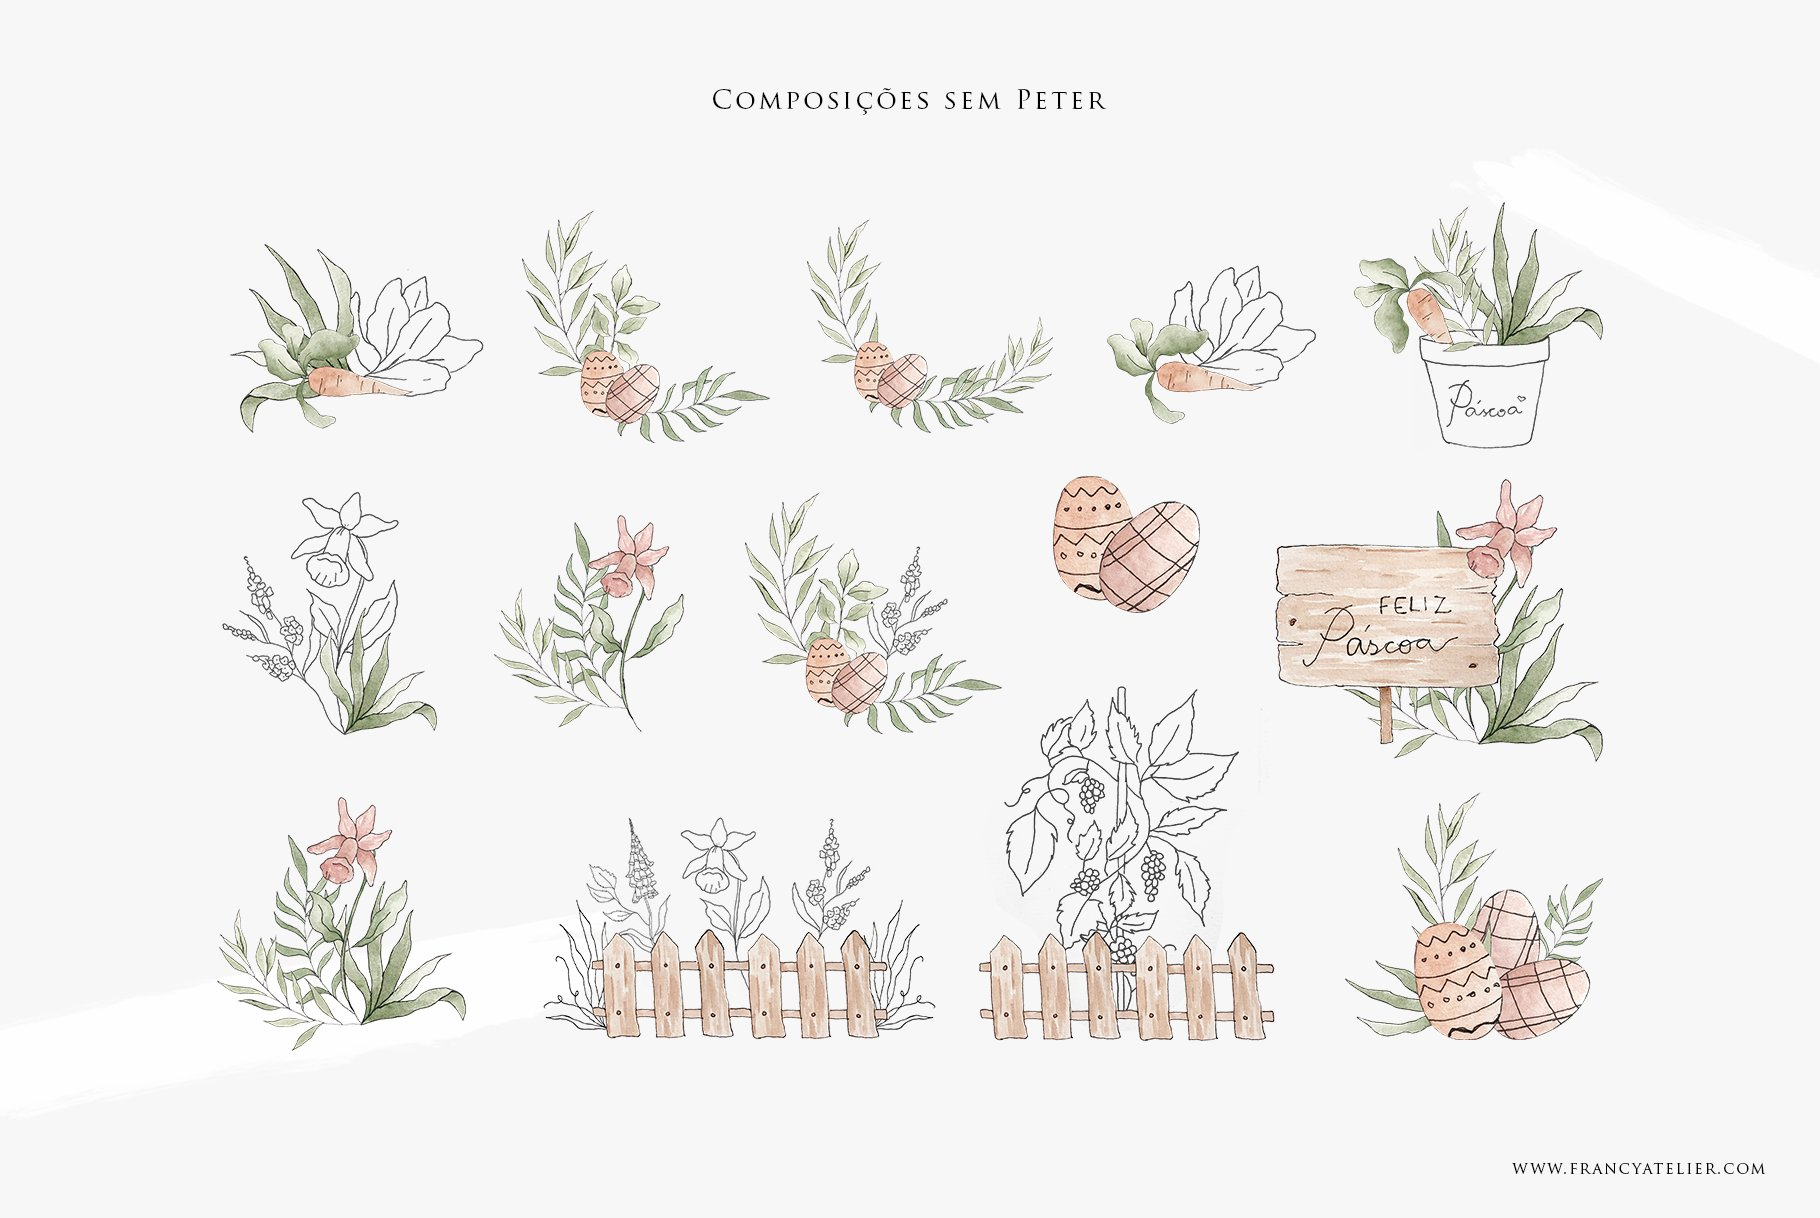 Composições sem Peter